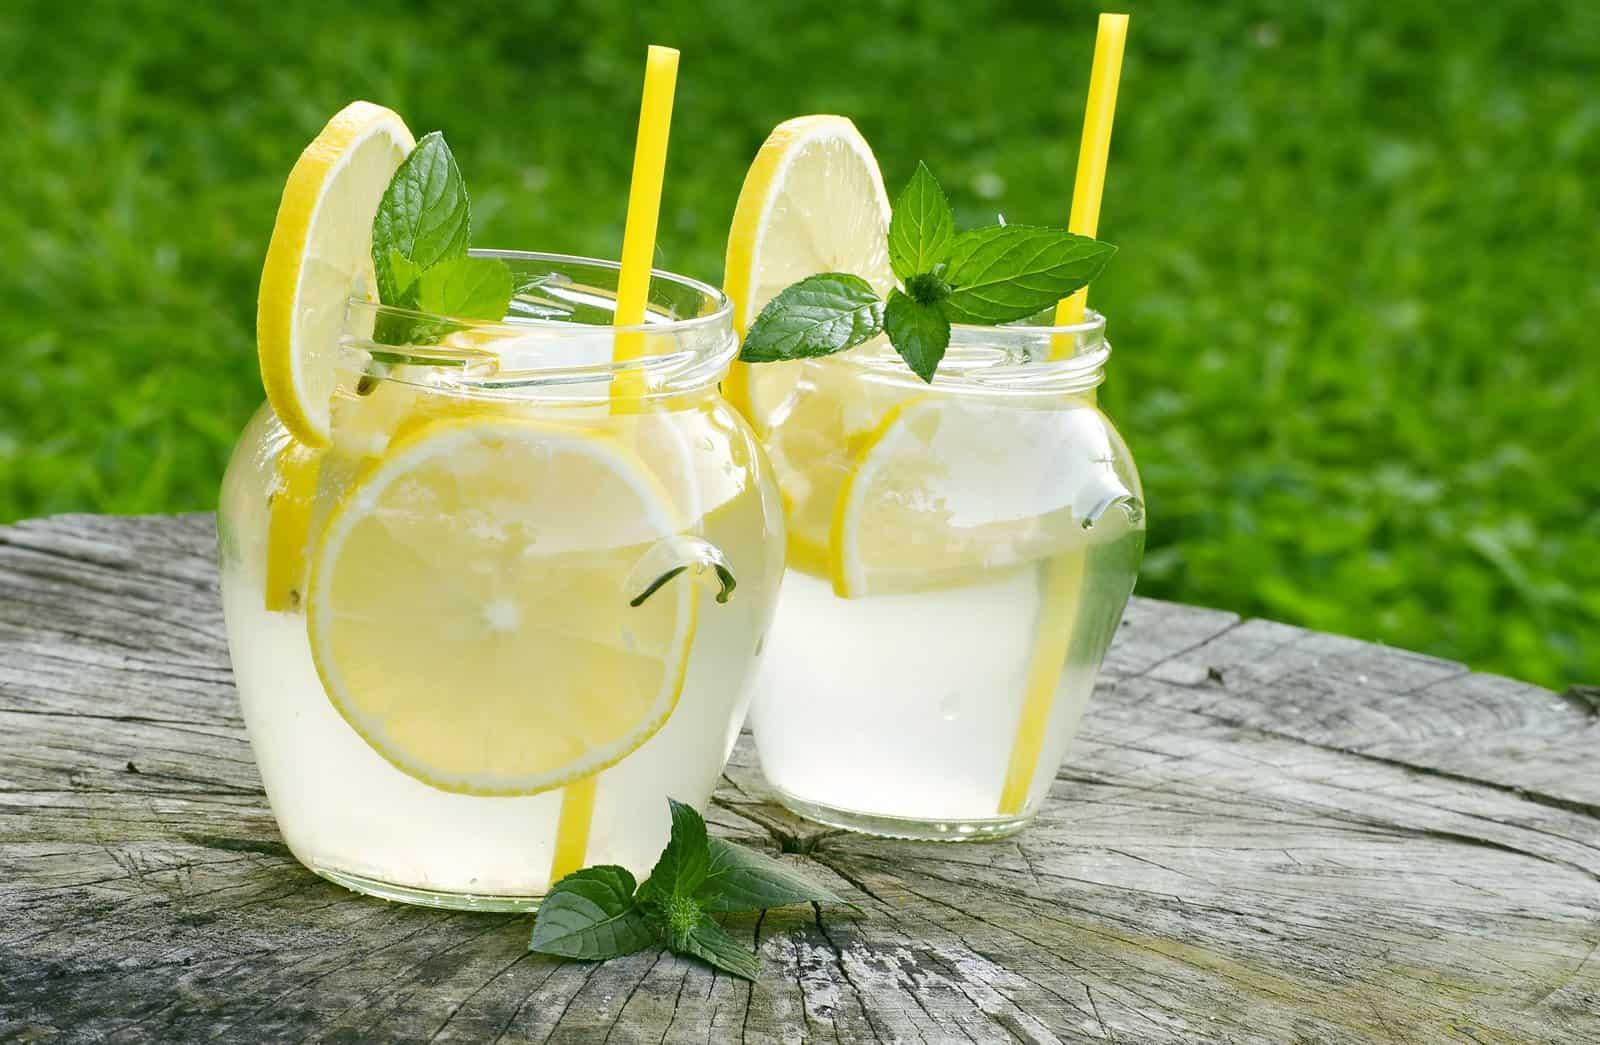 Cannabis infused lemonade